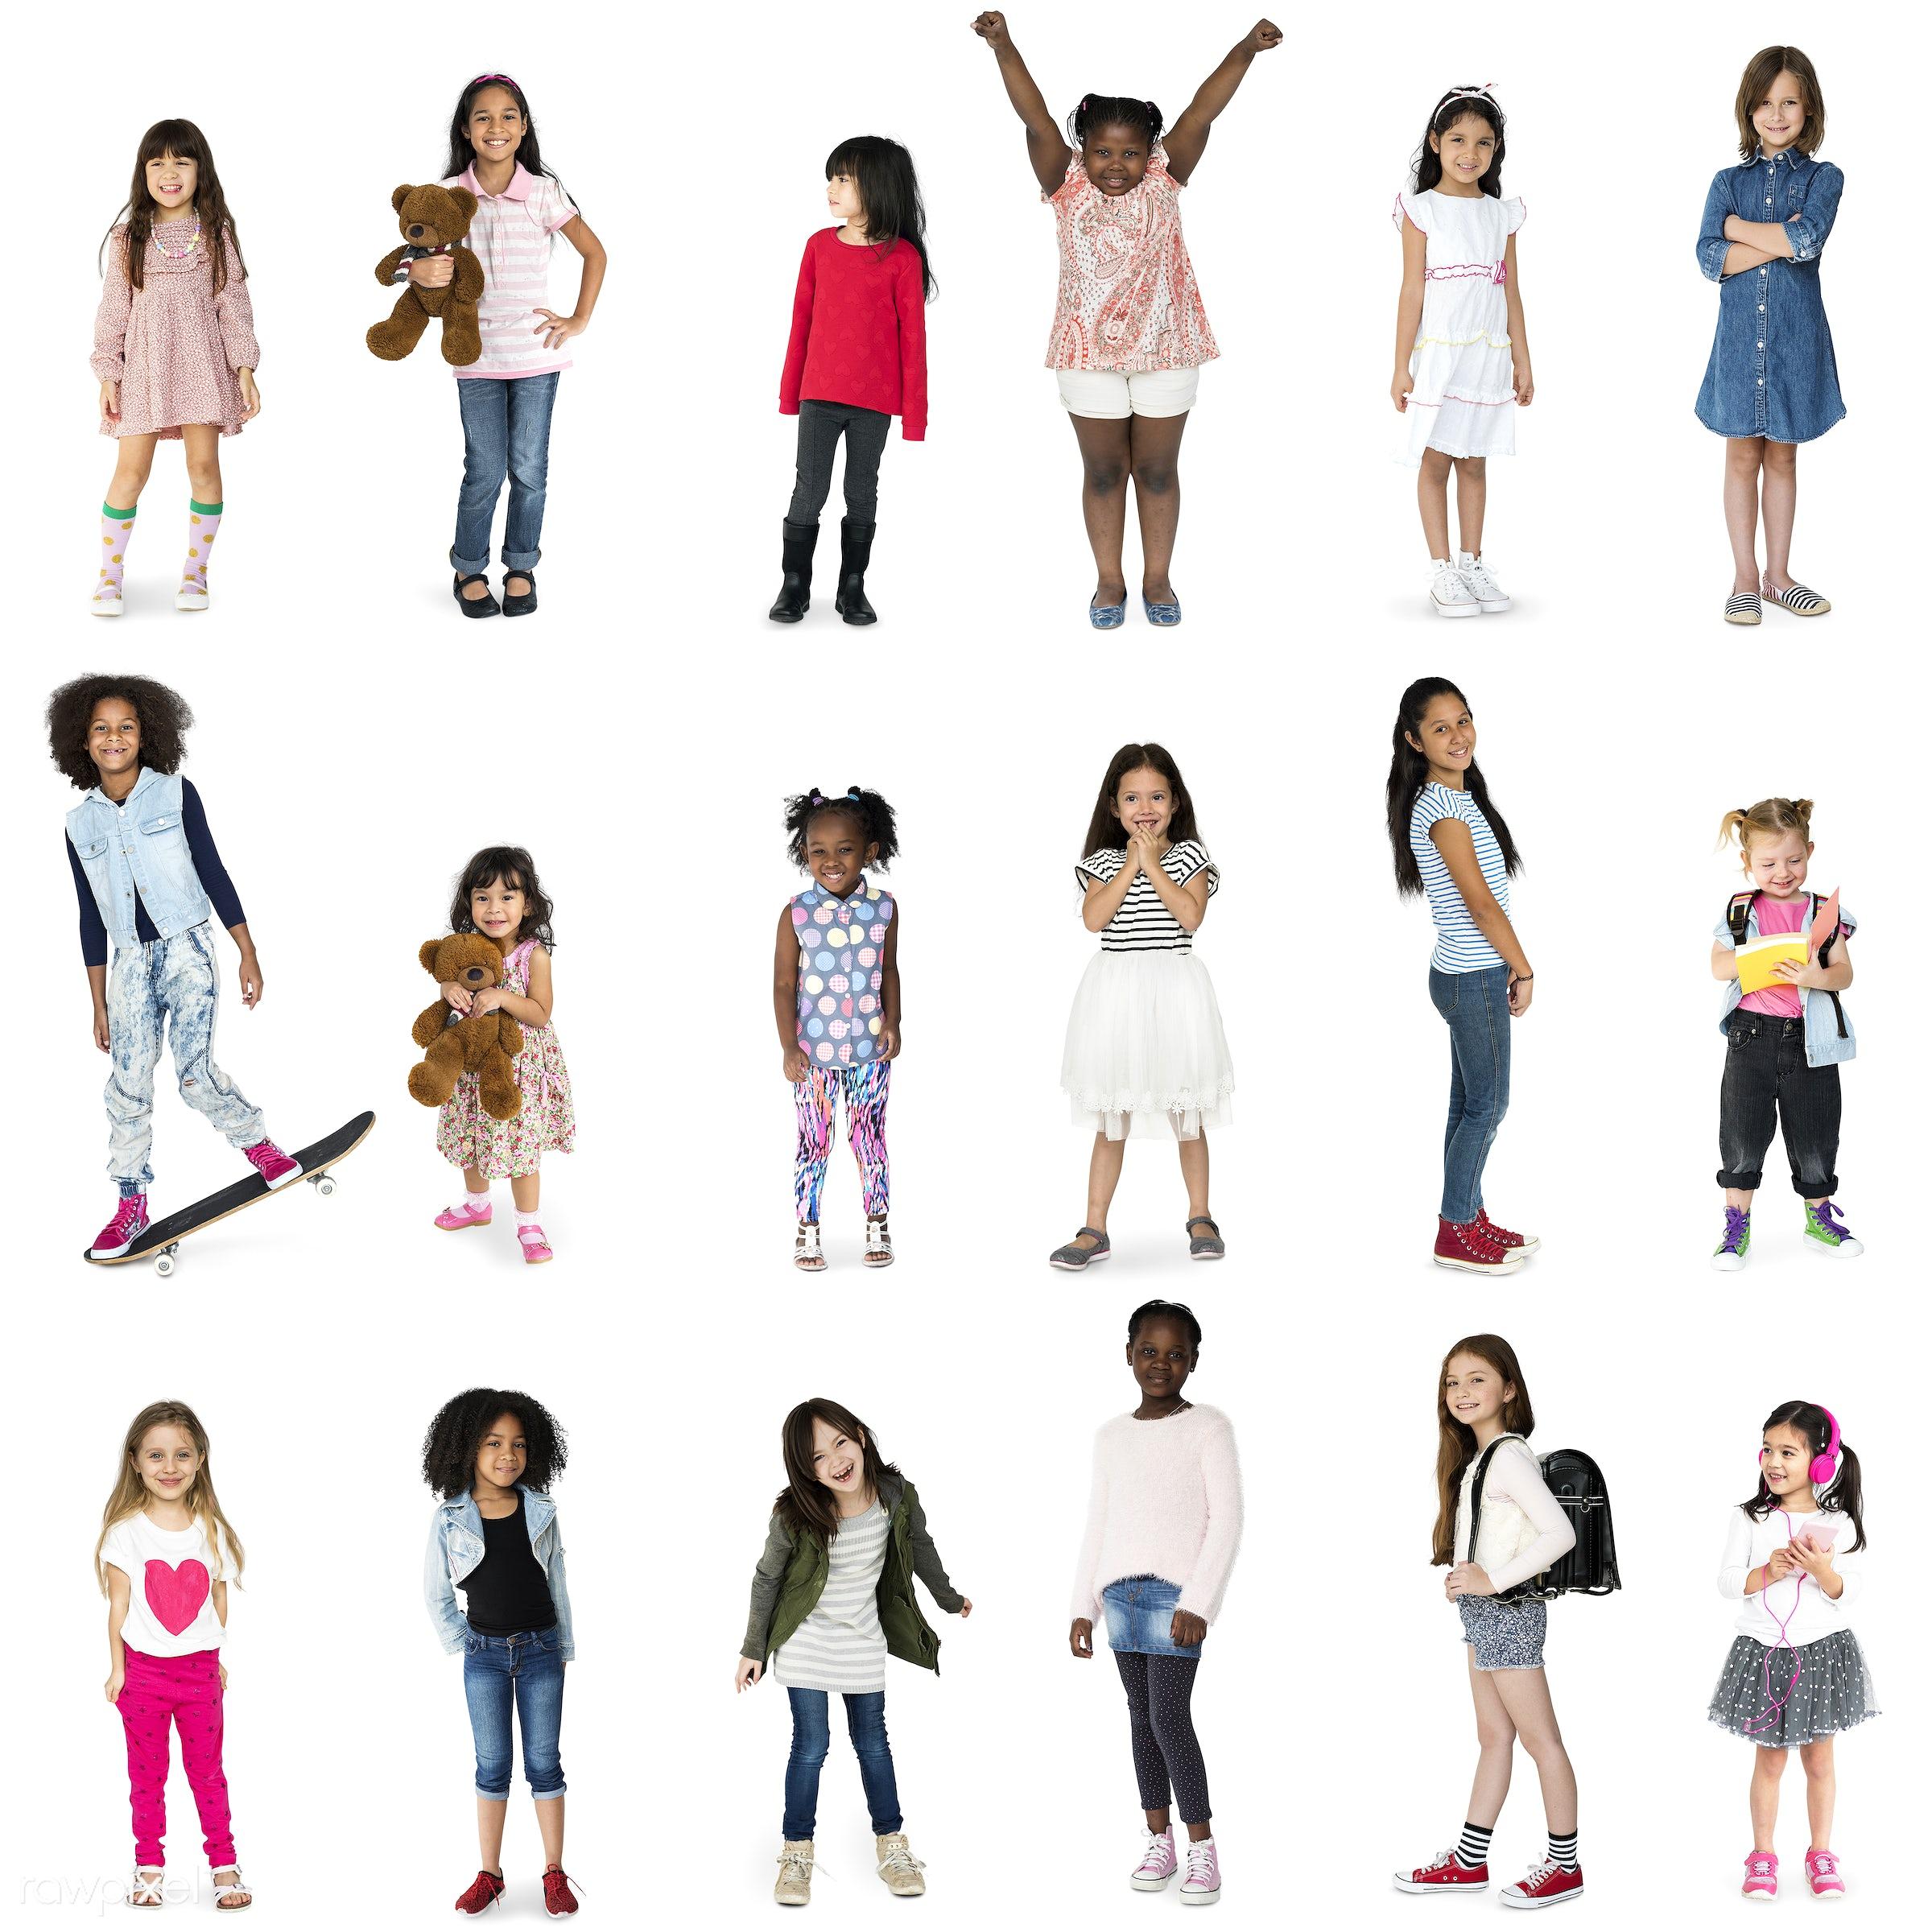 studio, person, diverse, set, children, little, entertain, collection, recreation, pretty, people, caucasian, asian, child,...